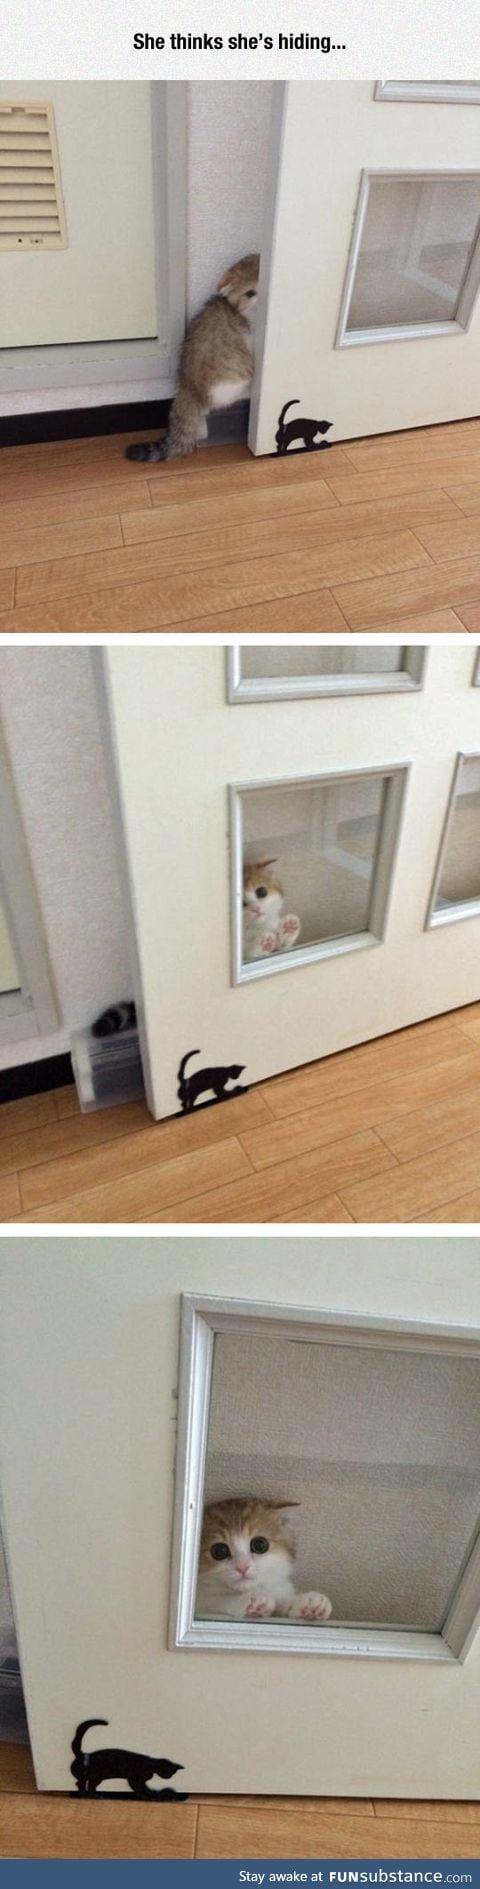 I see no kitty